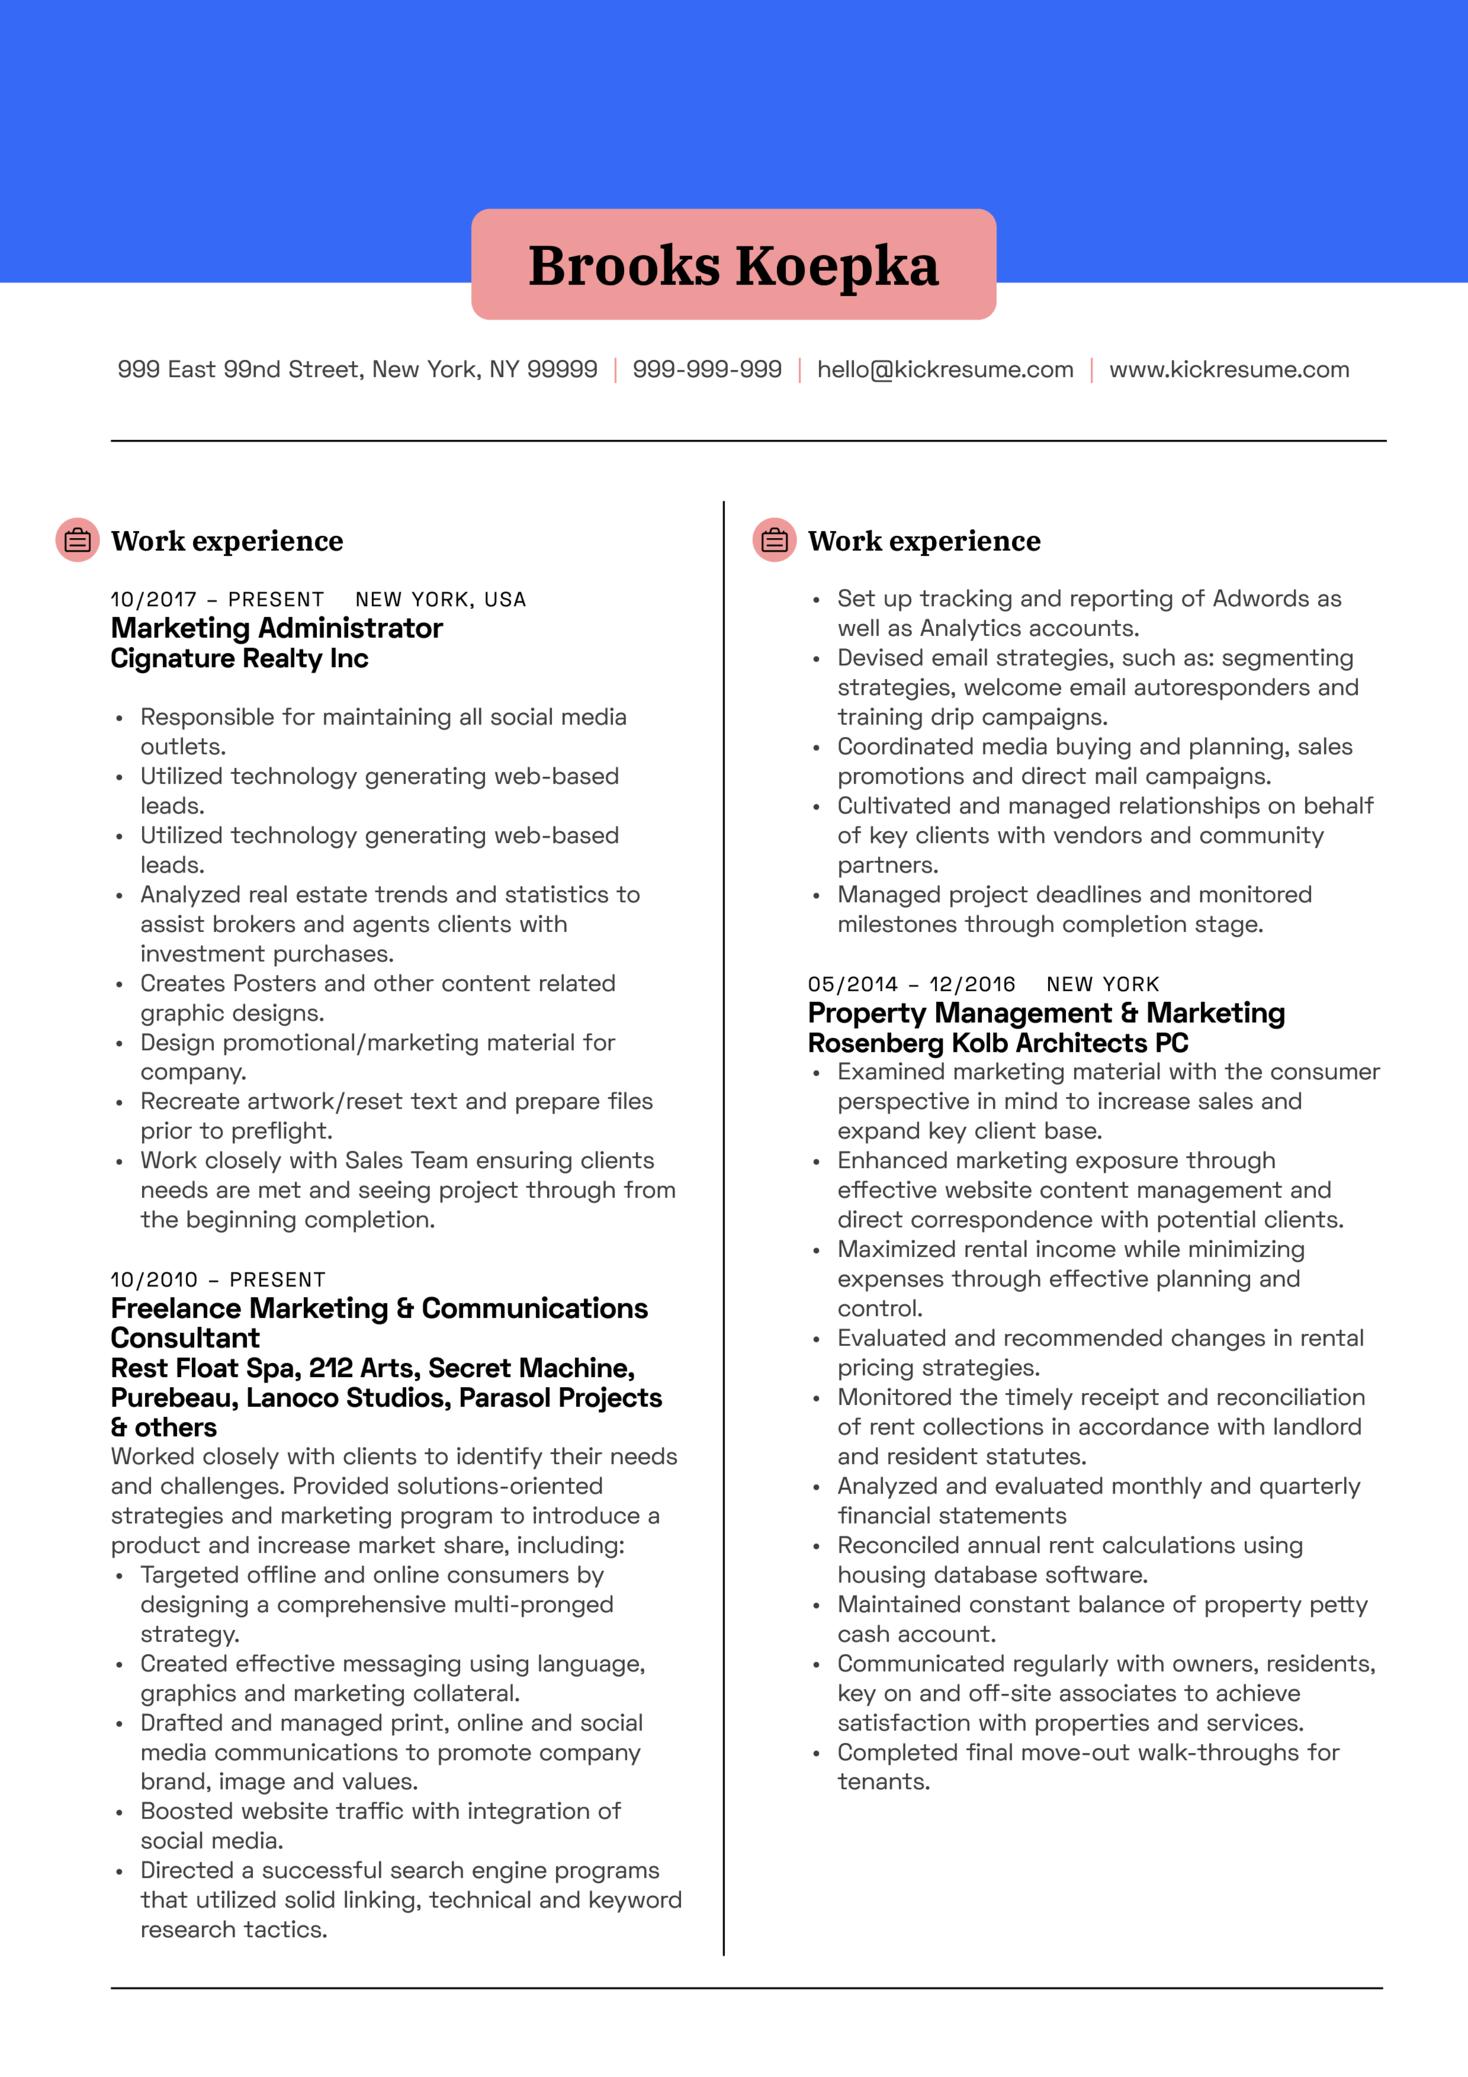 Marketing Manager CV Example (parte 1)